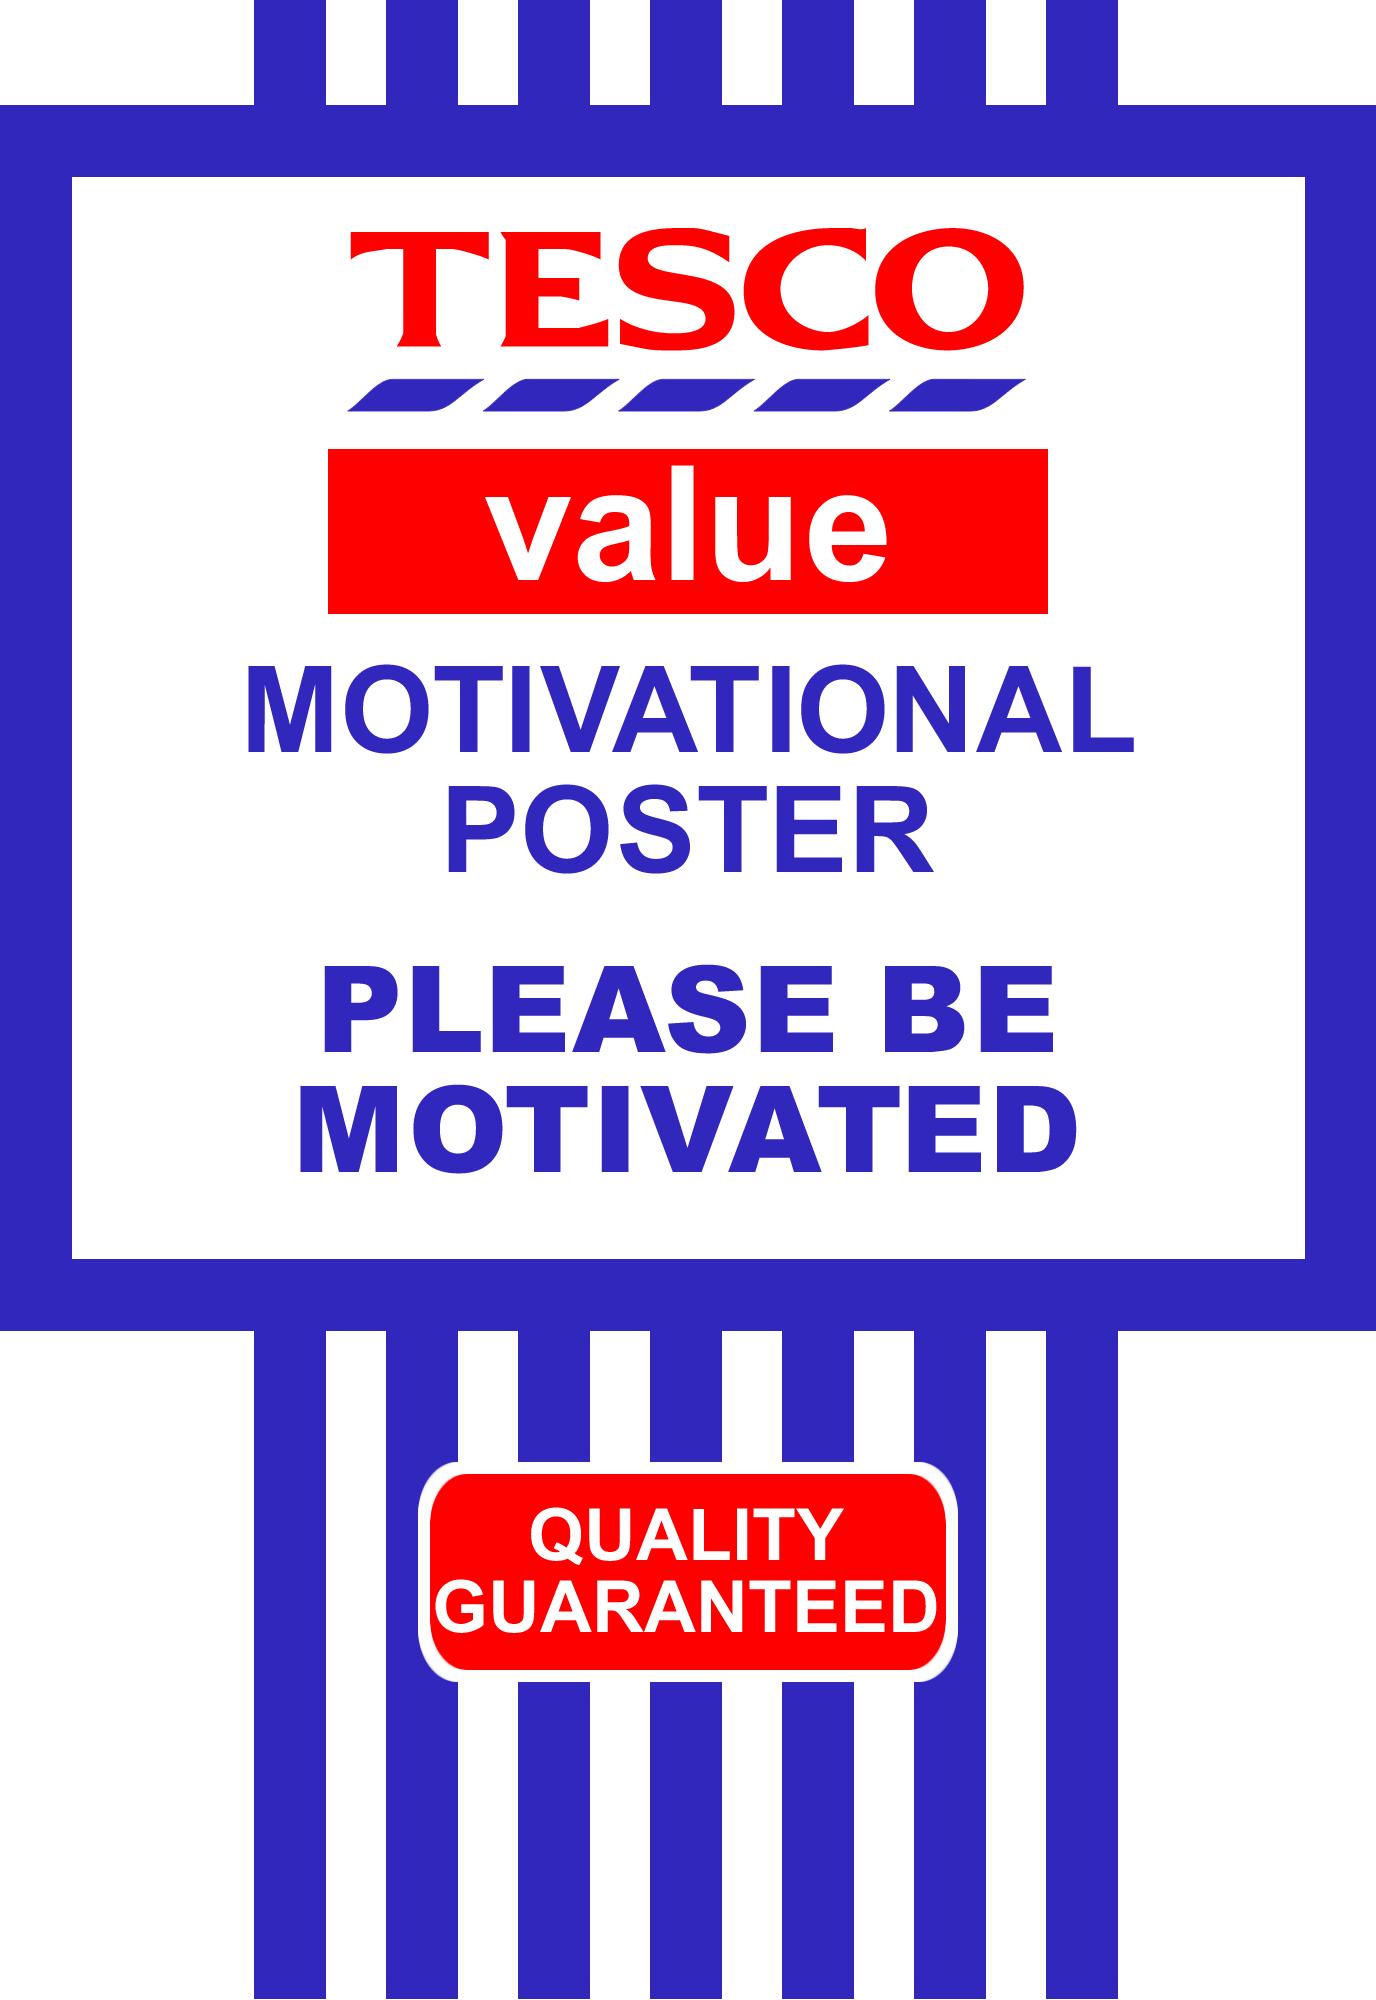 Tesco-Value-Motivational-Poster.png